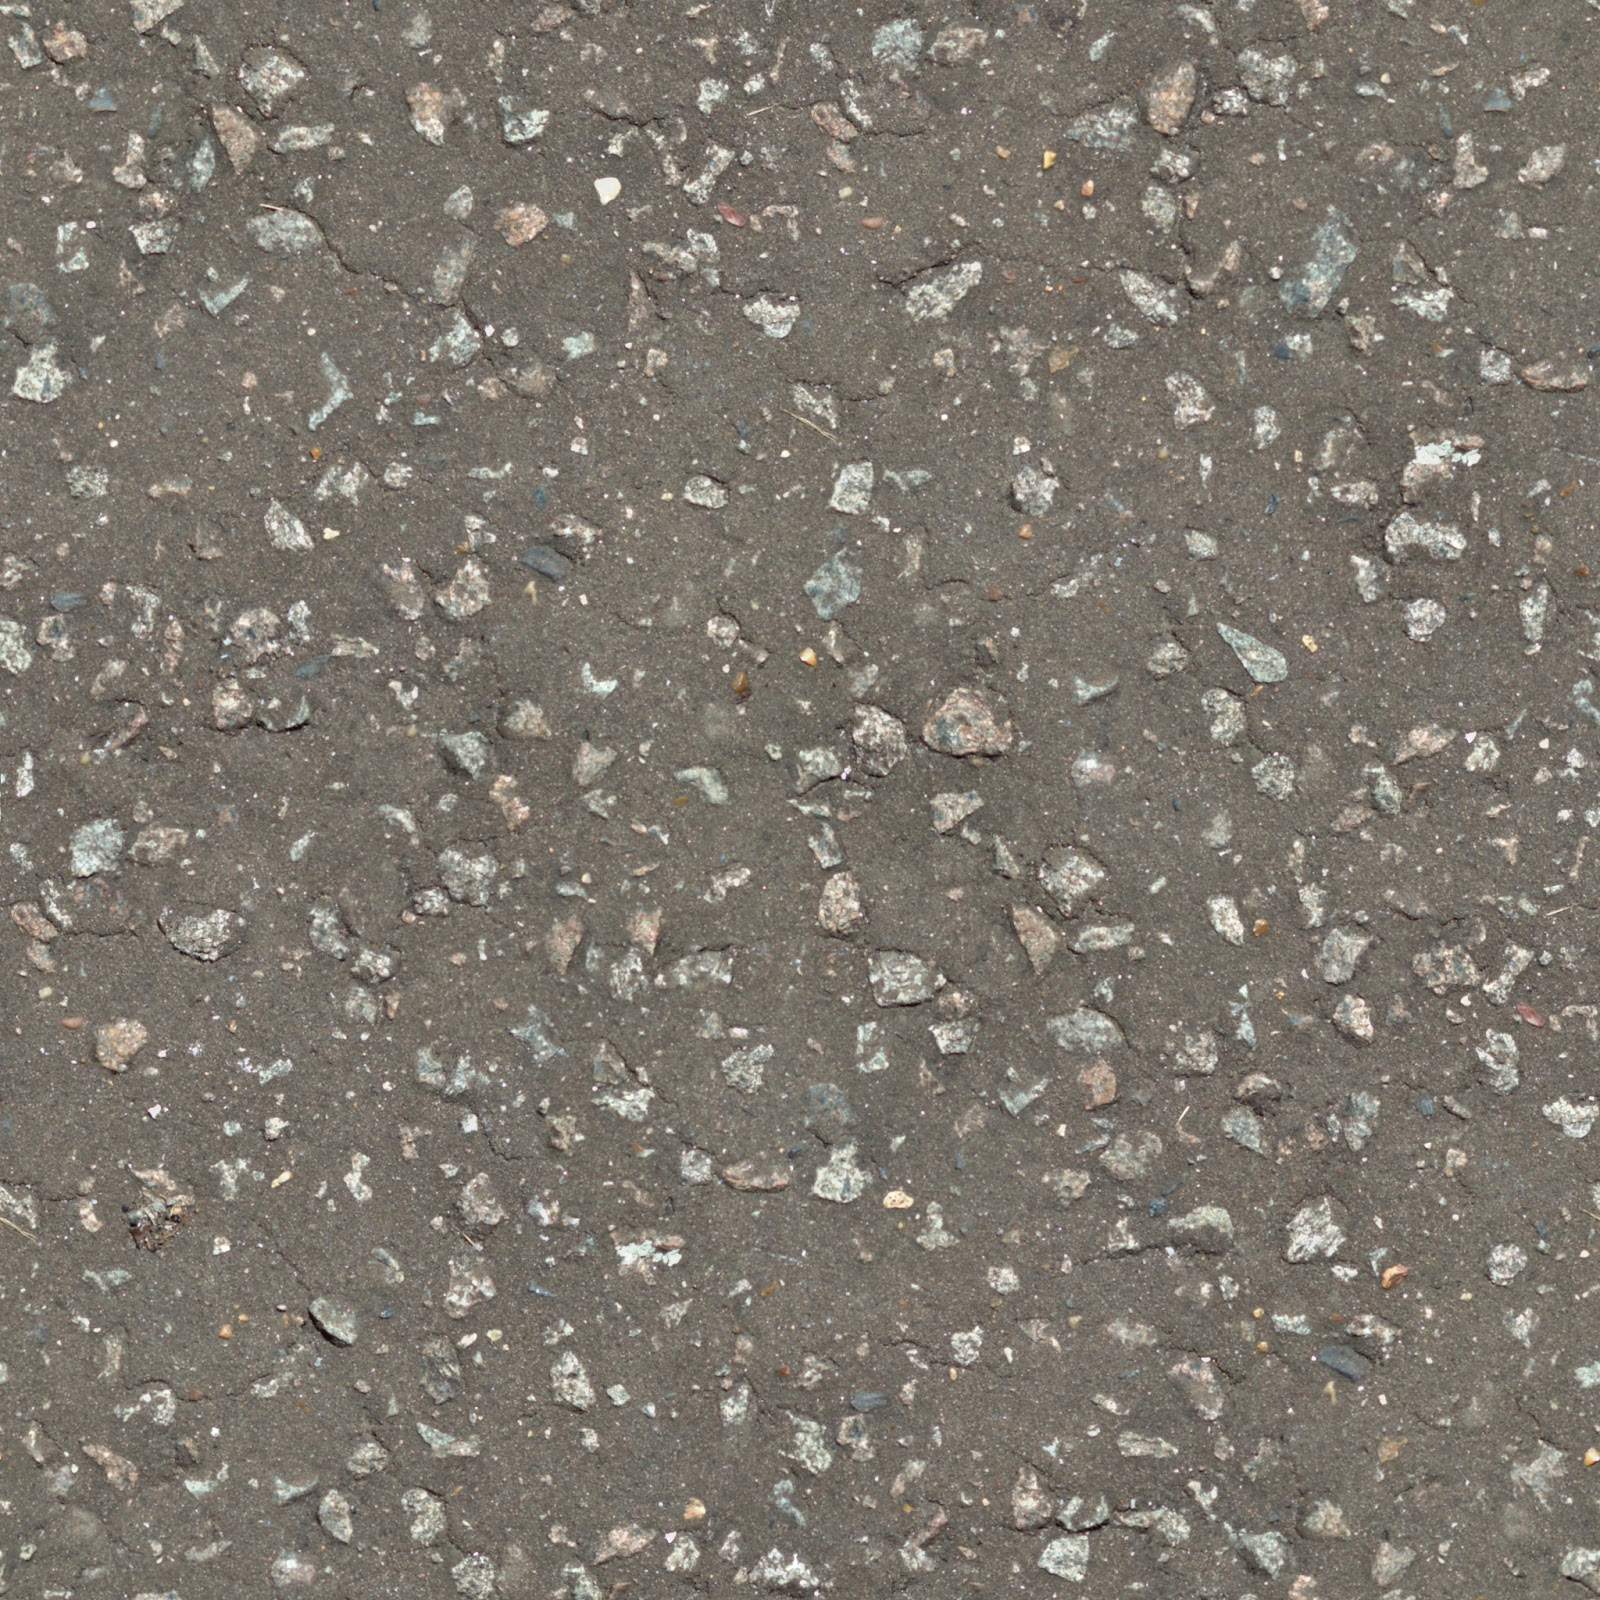 HIGH RESOLUTION SEAMLESS TEXTURES: Concrete Dirt Ground